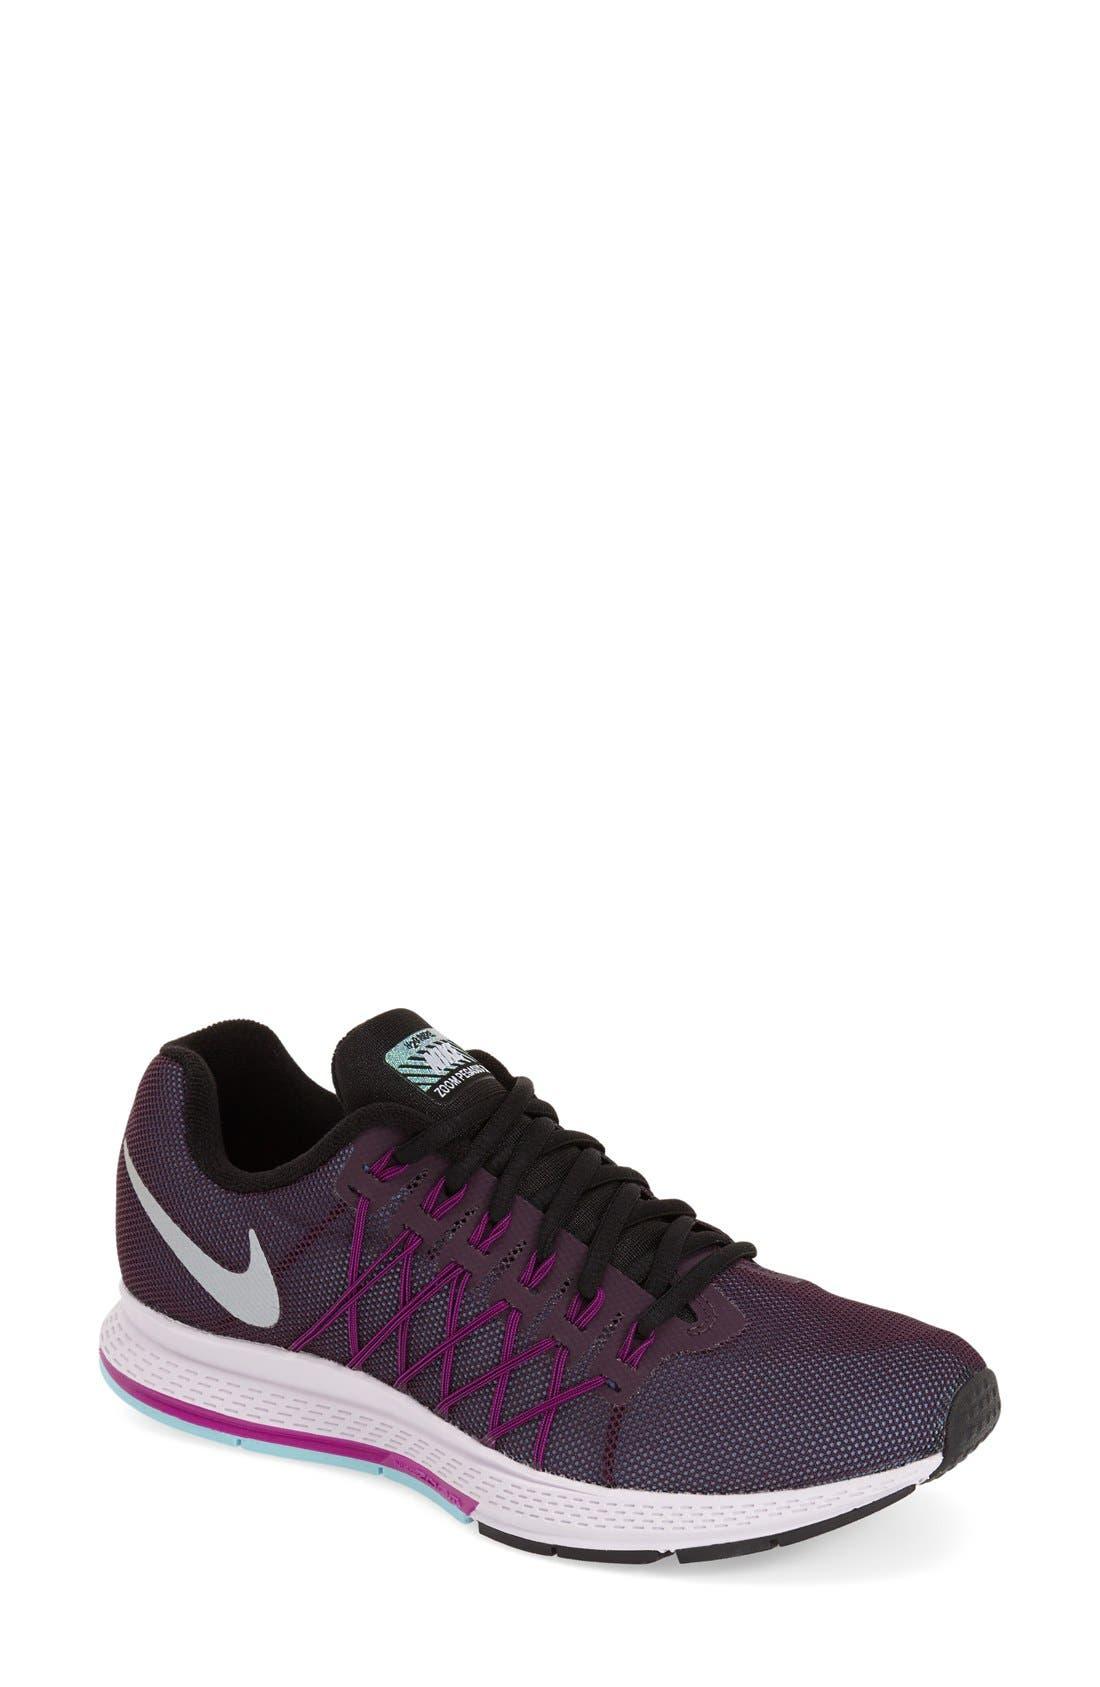 Main Image - Nike 'Zoom Pegasus 32 - Flash' h2o Repel Running Shoe (Women)